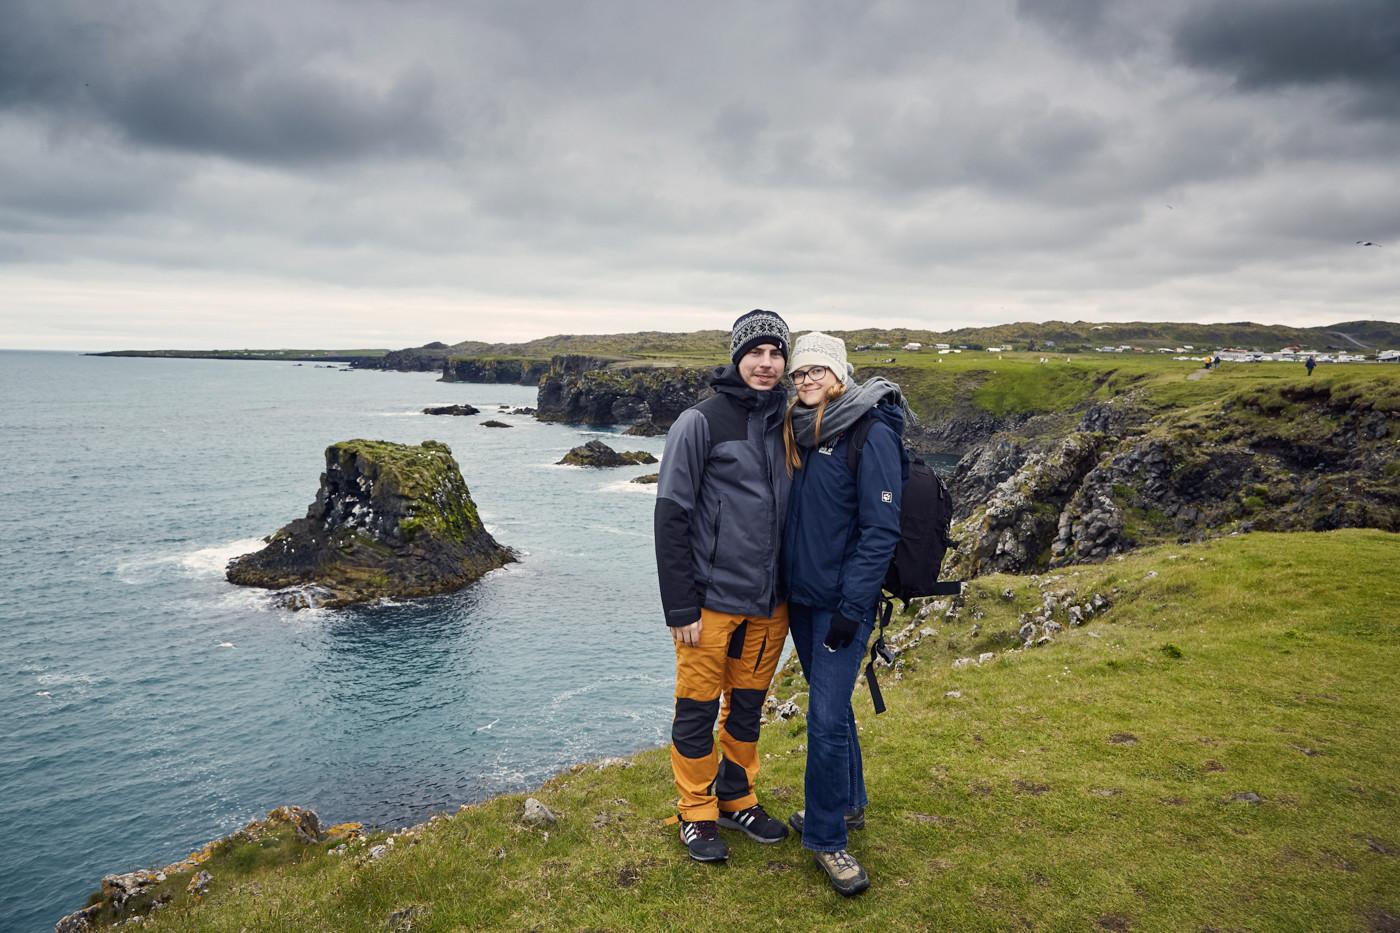 Chrisi und Ronnie, Reiseblogger, Miles and Shores, Anarstapi, Snaeffelsnes, Island, Iceland